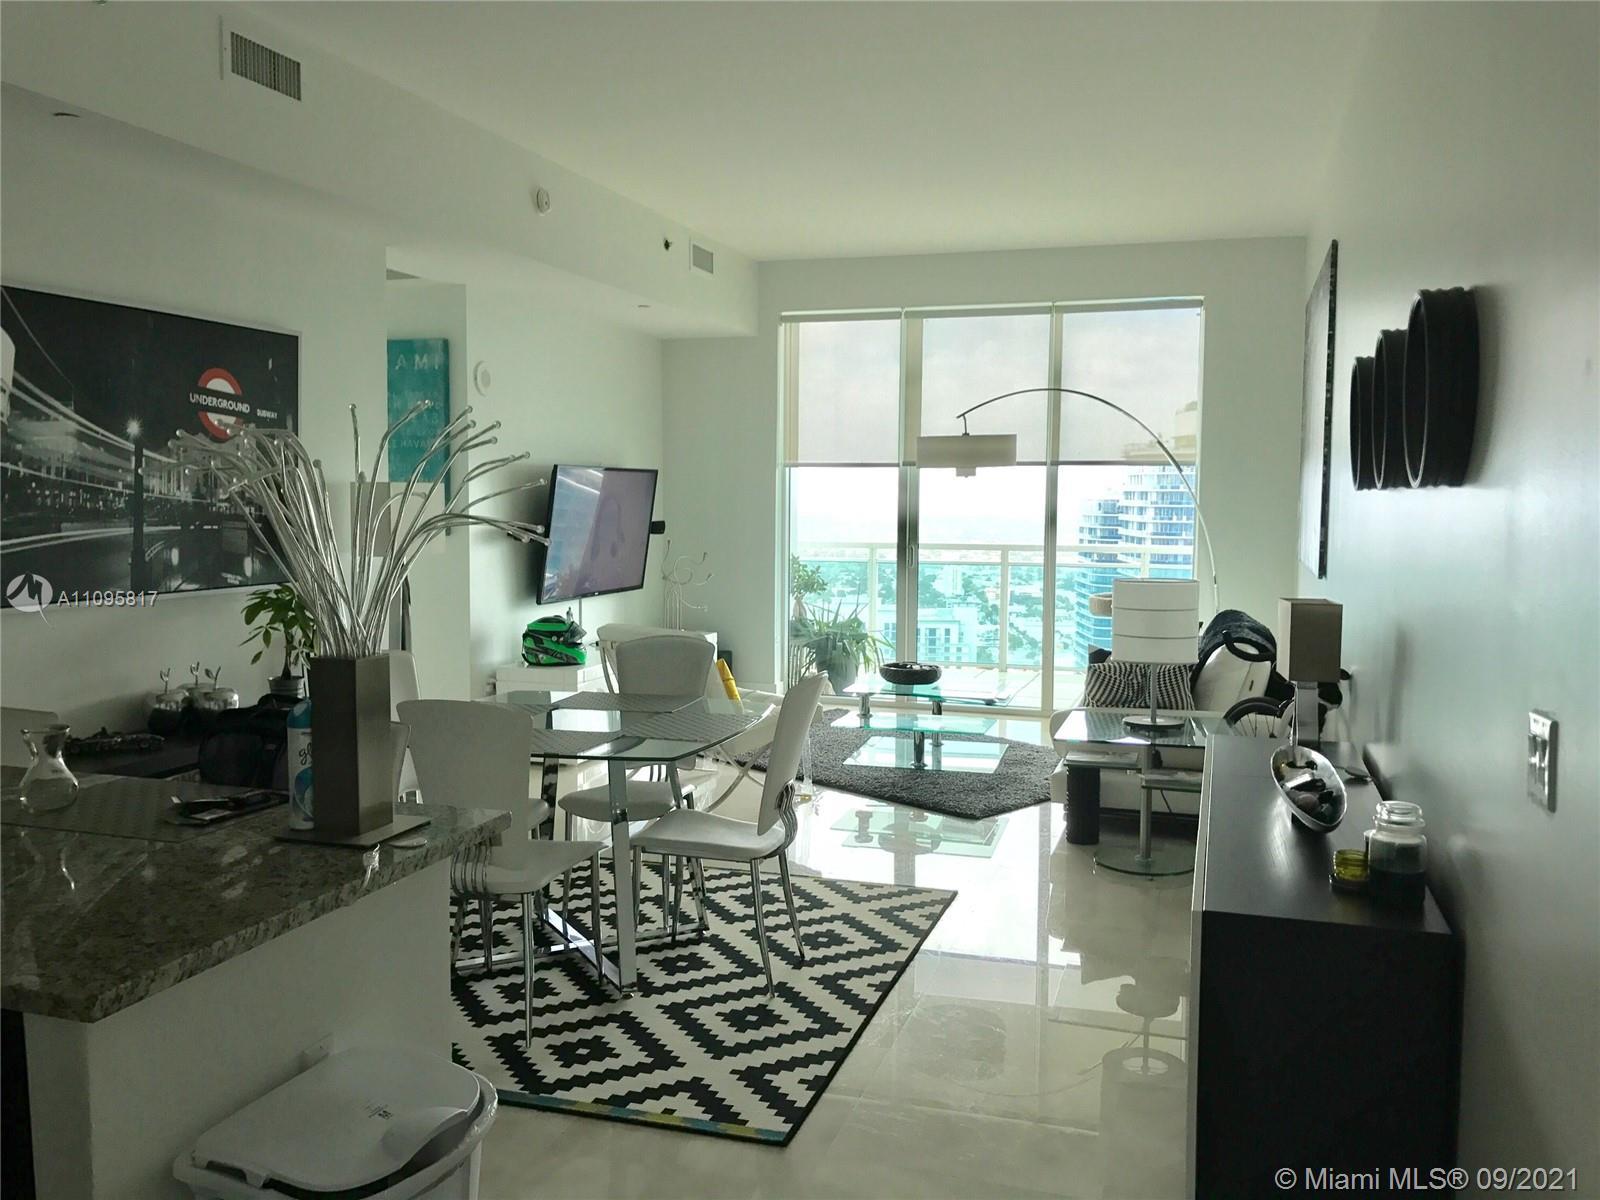 The Plaza on Brickell 1 #5001 - 950 Brickell Bay Dr #5001, Miami, FL 33131